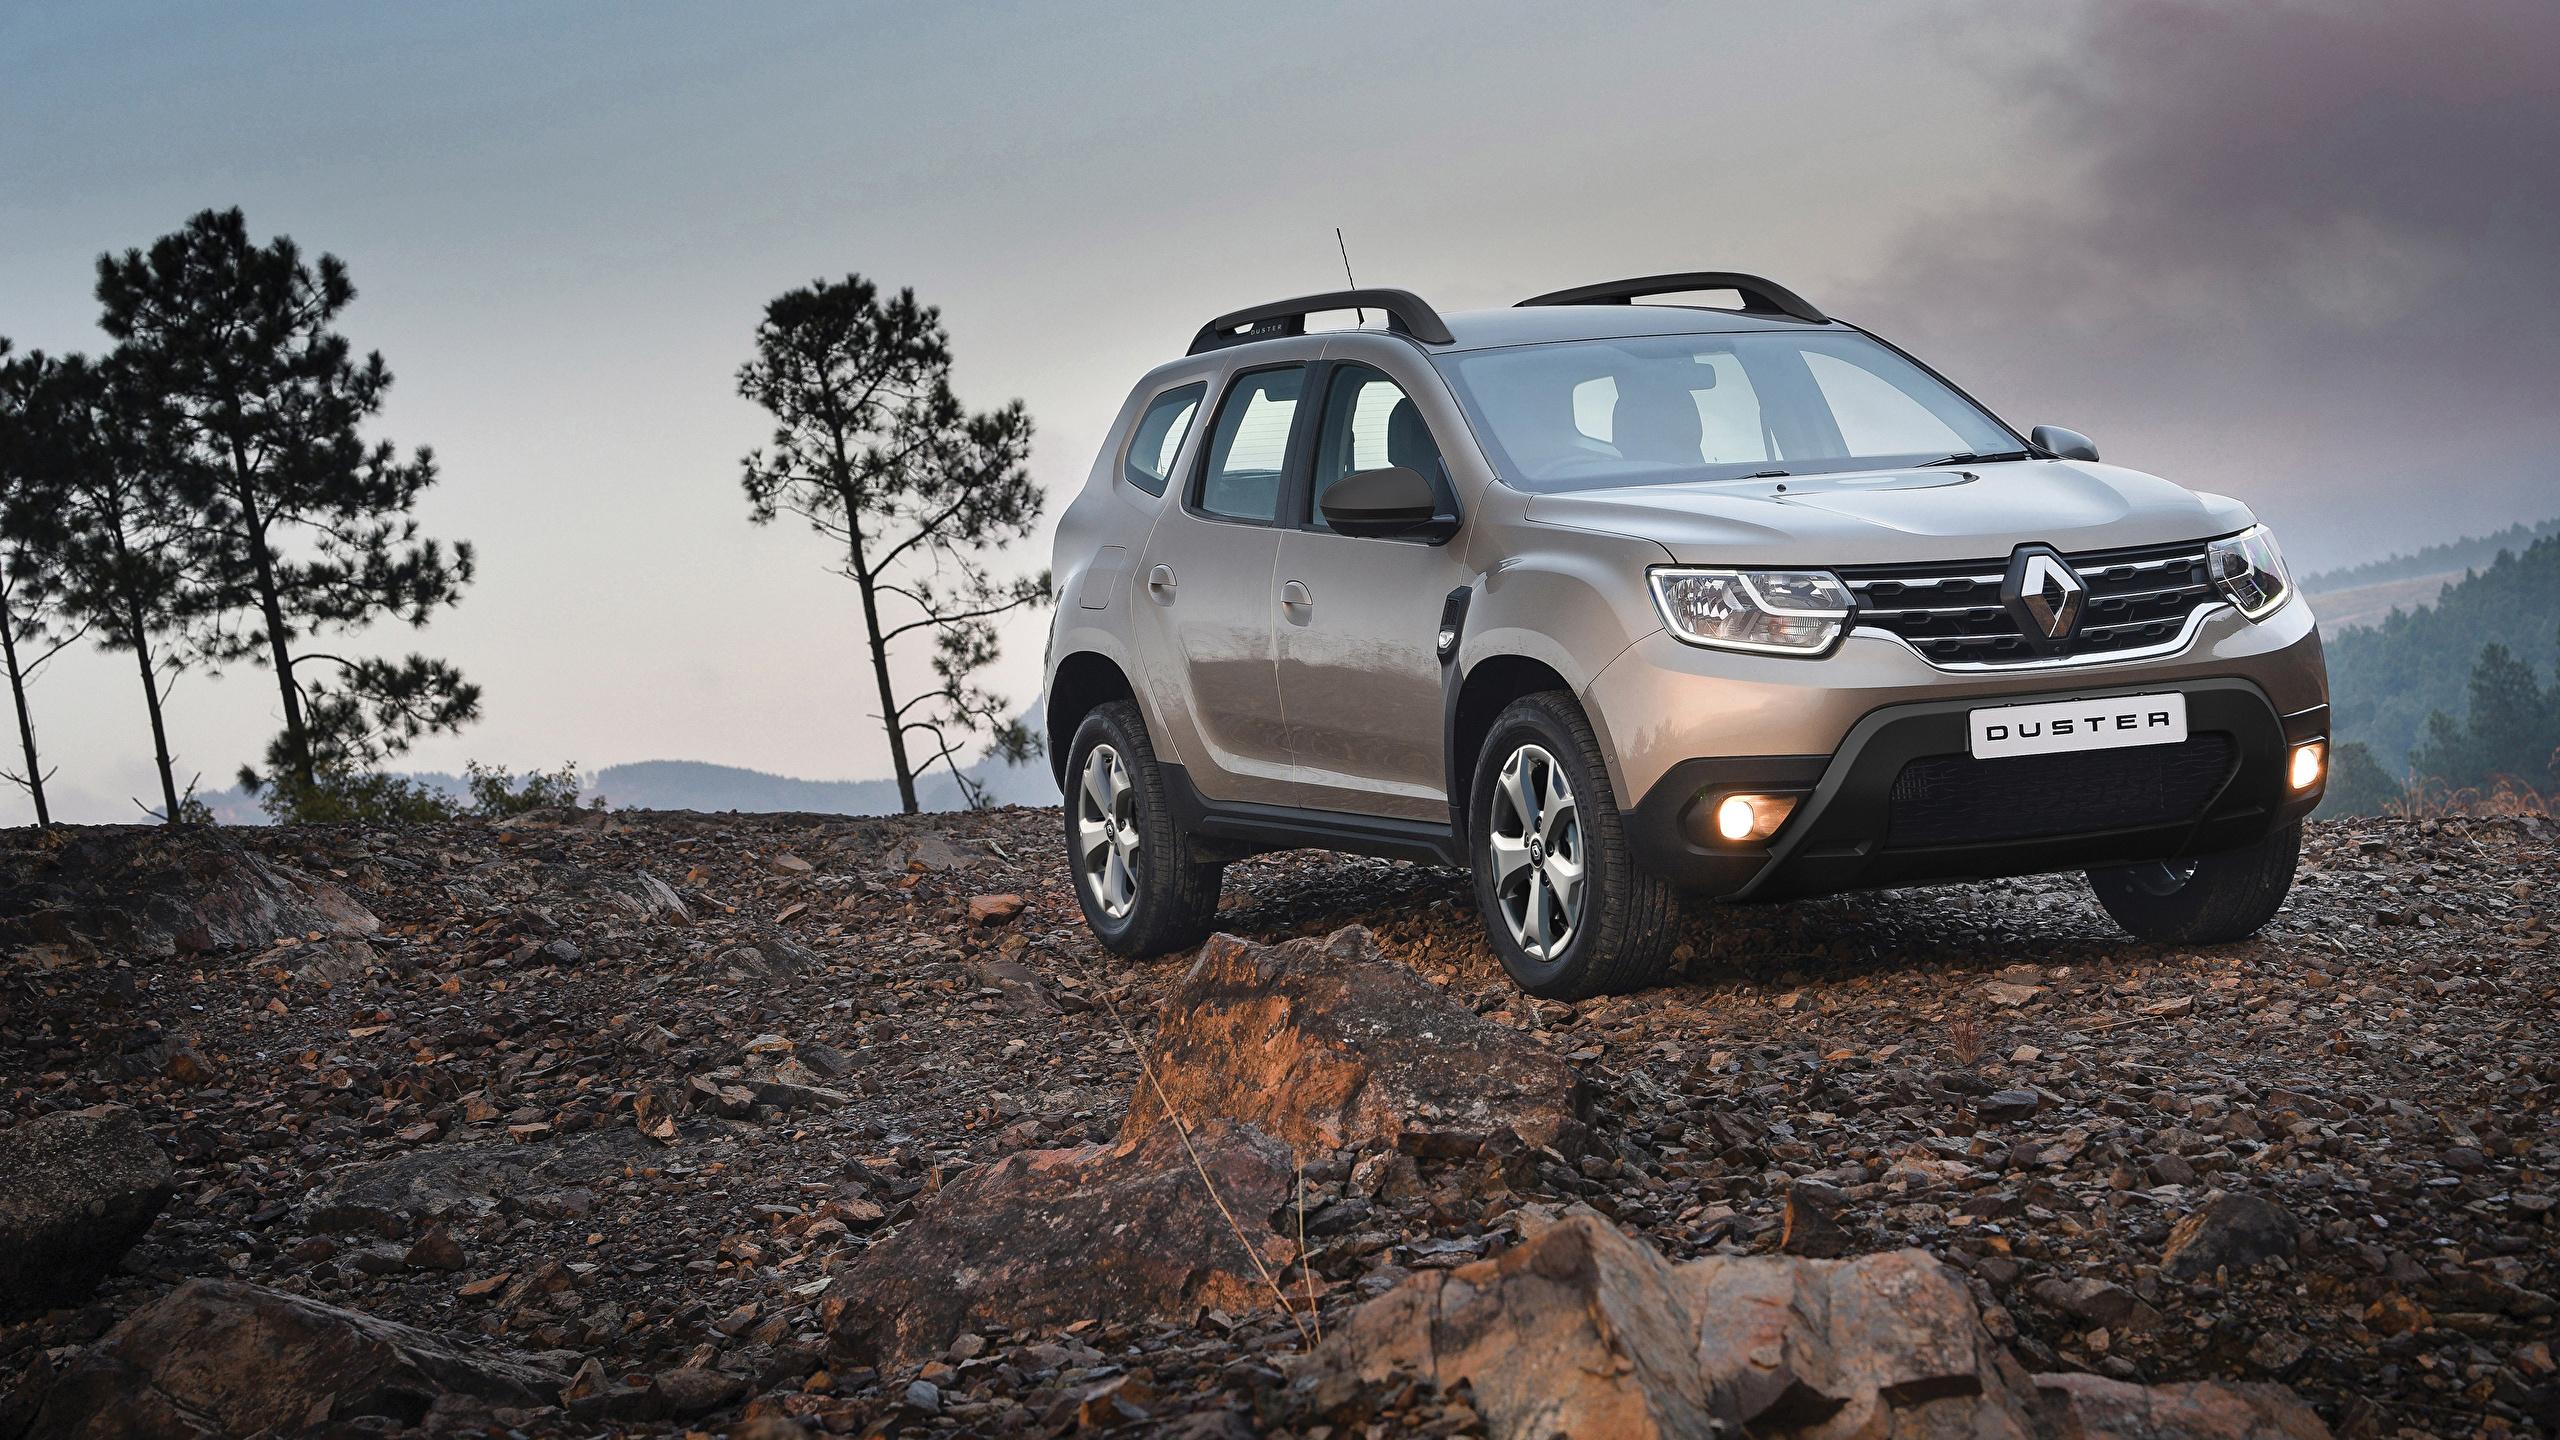 Fondos De Pantalla 2560x1440 Renault 2018 19 Duster Coches